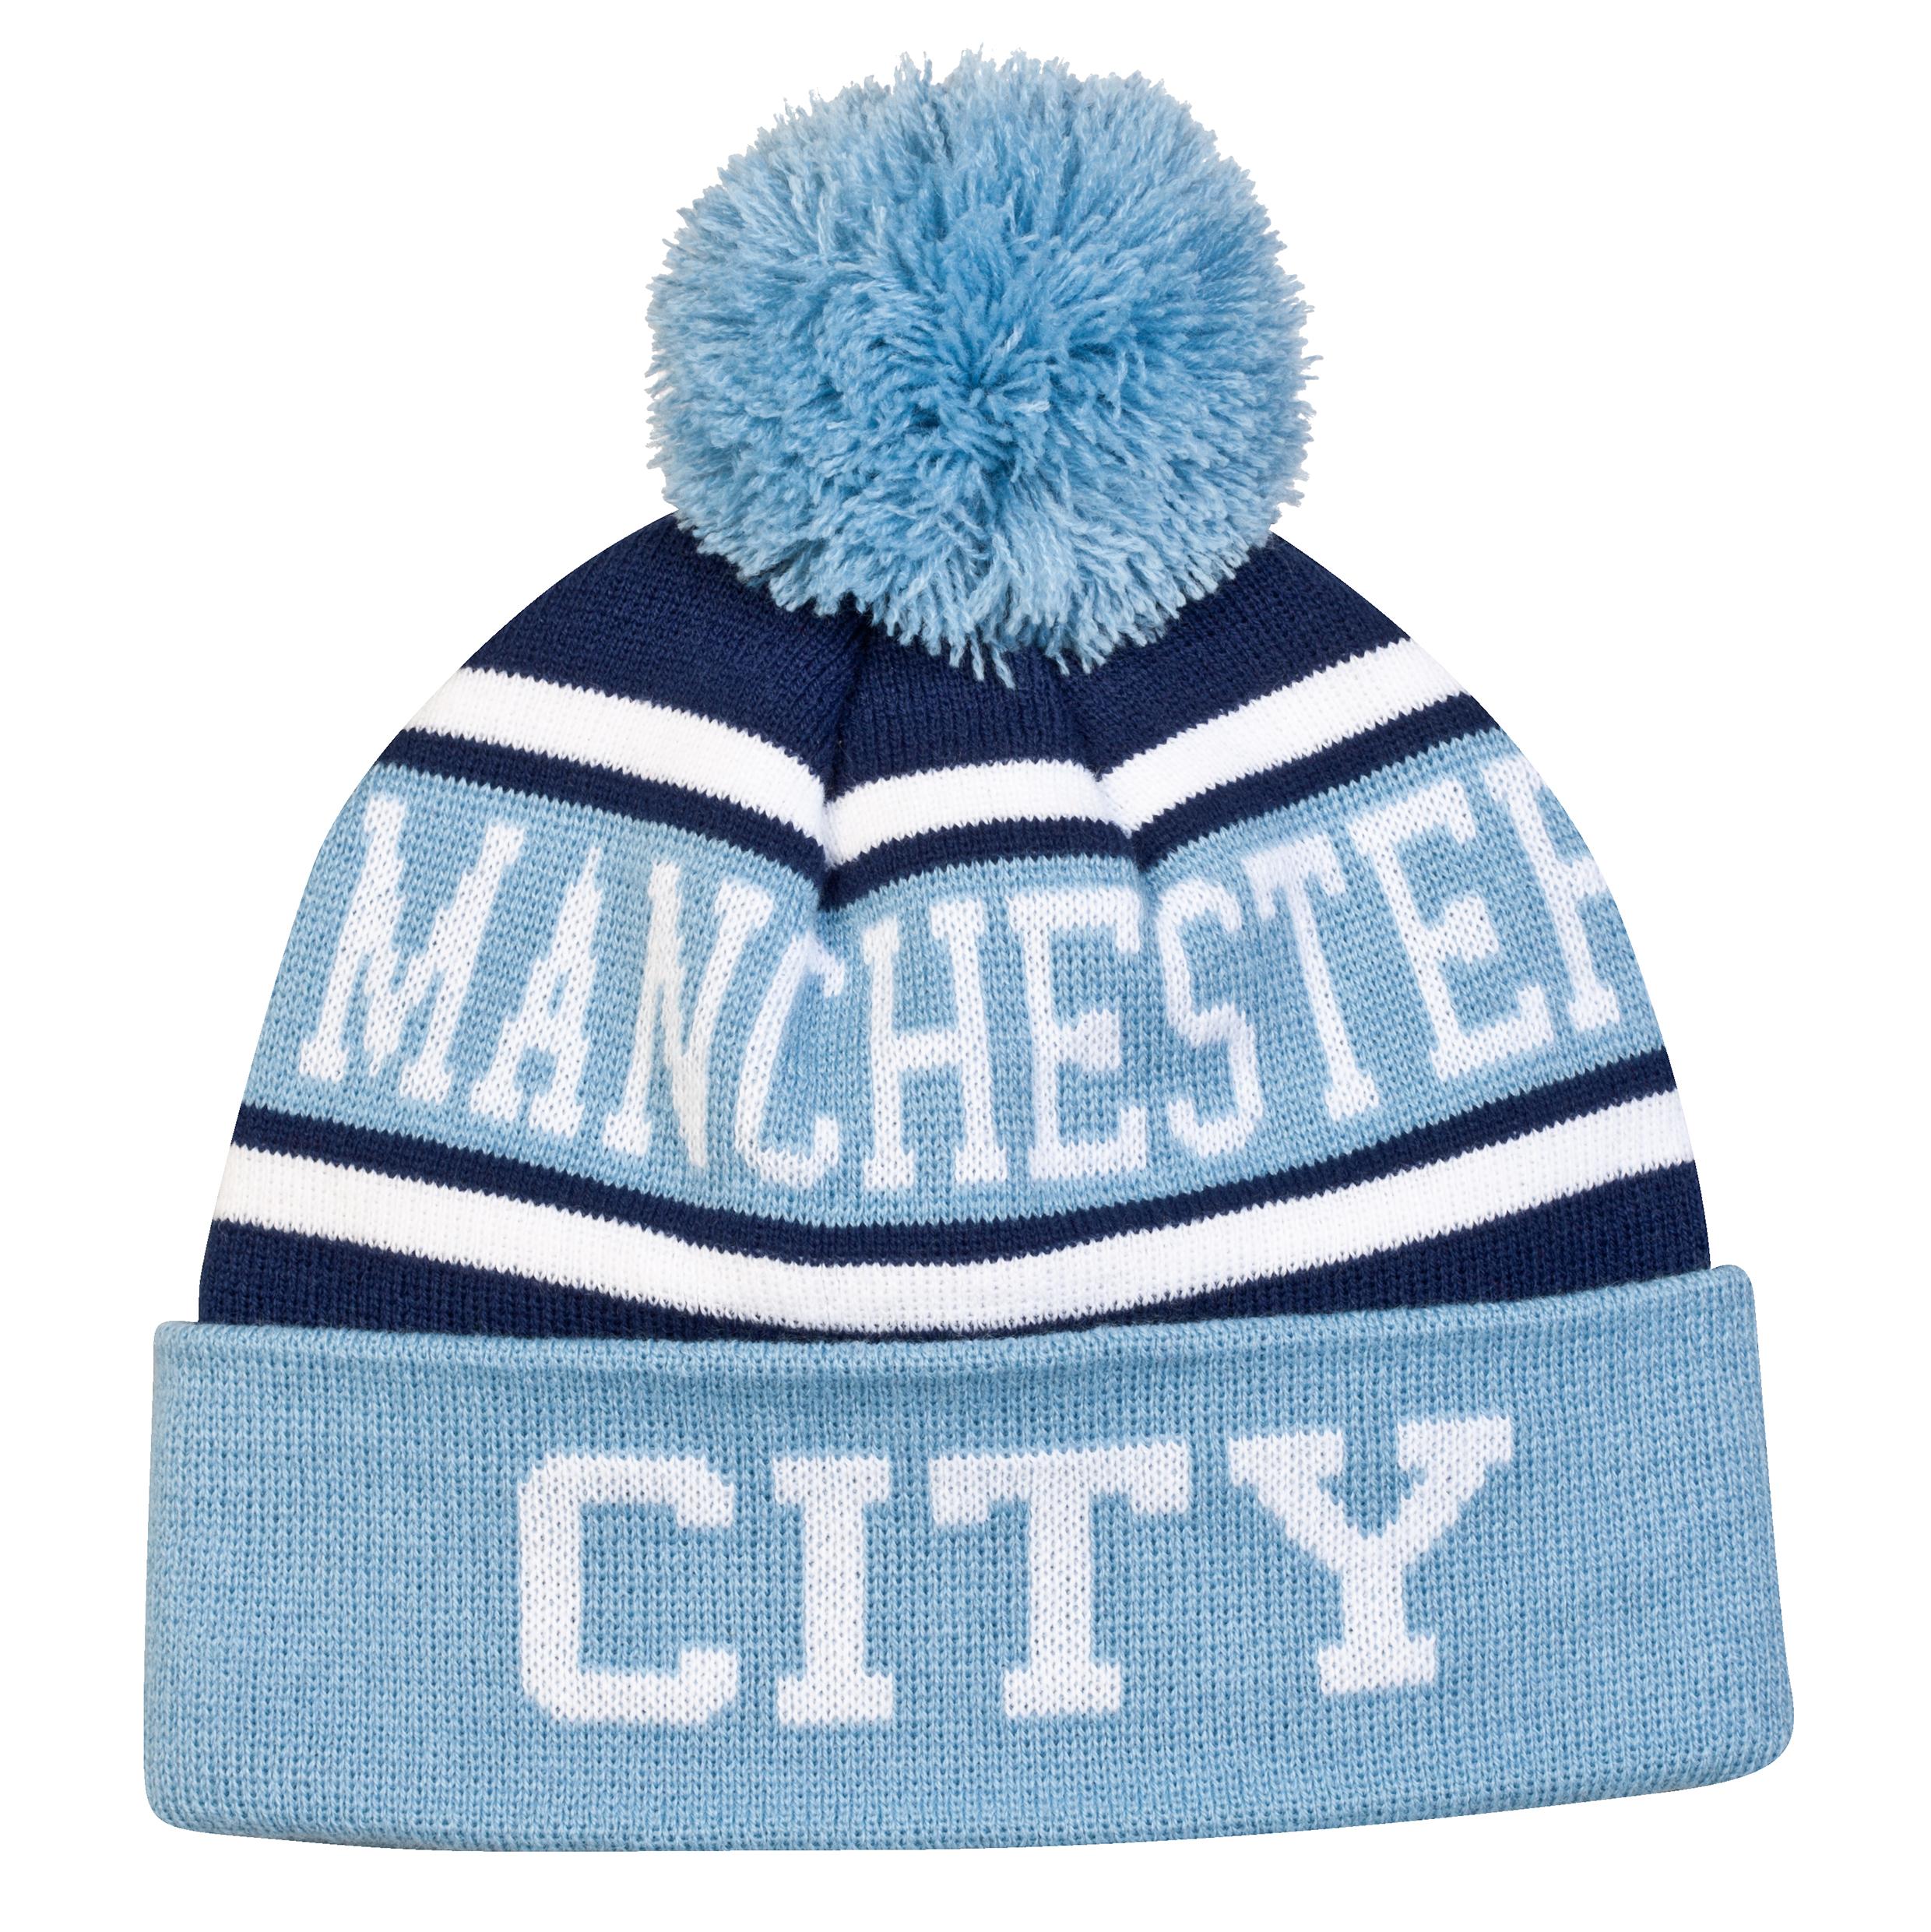 Manchester City Bobble Hat - Sky/Navy - -Adult